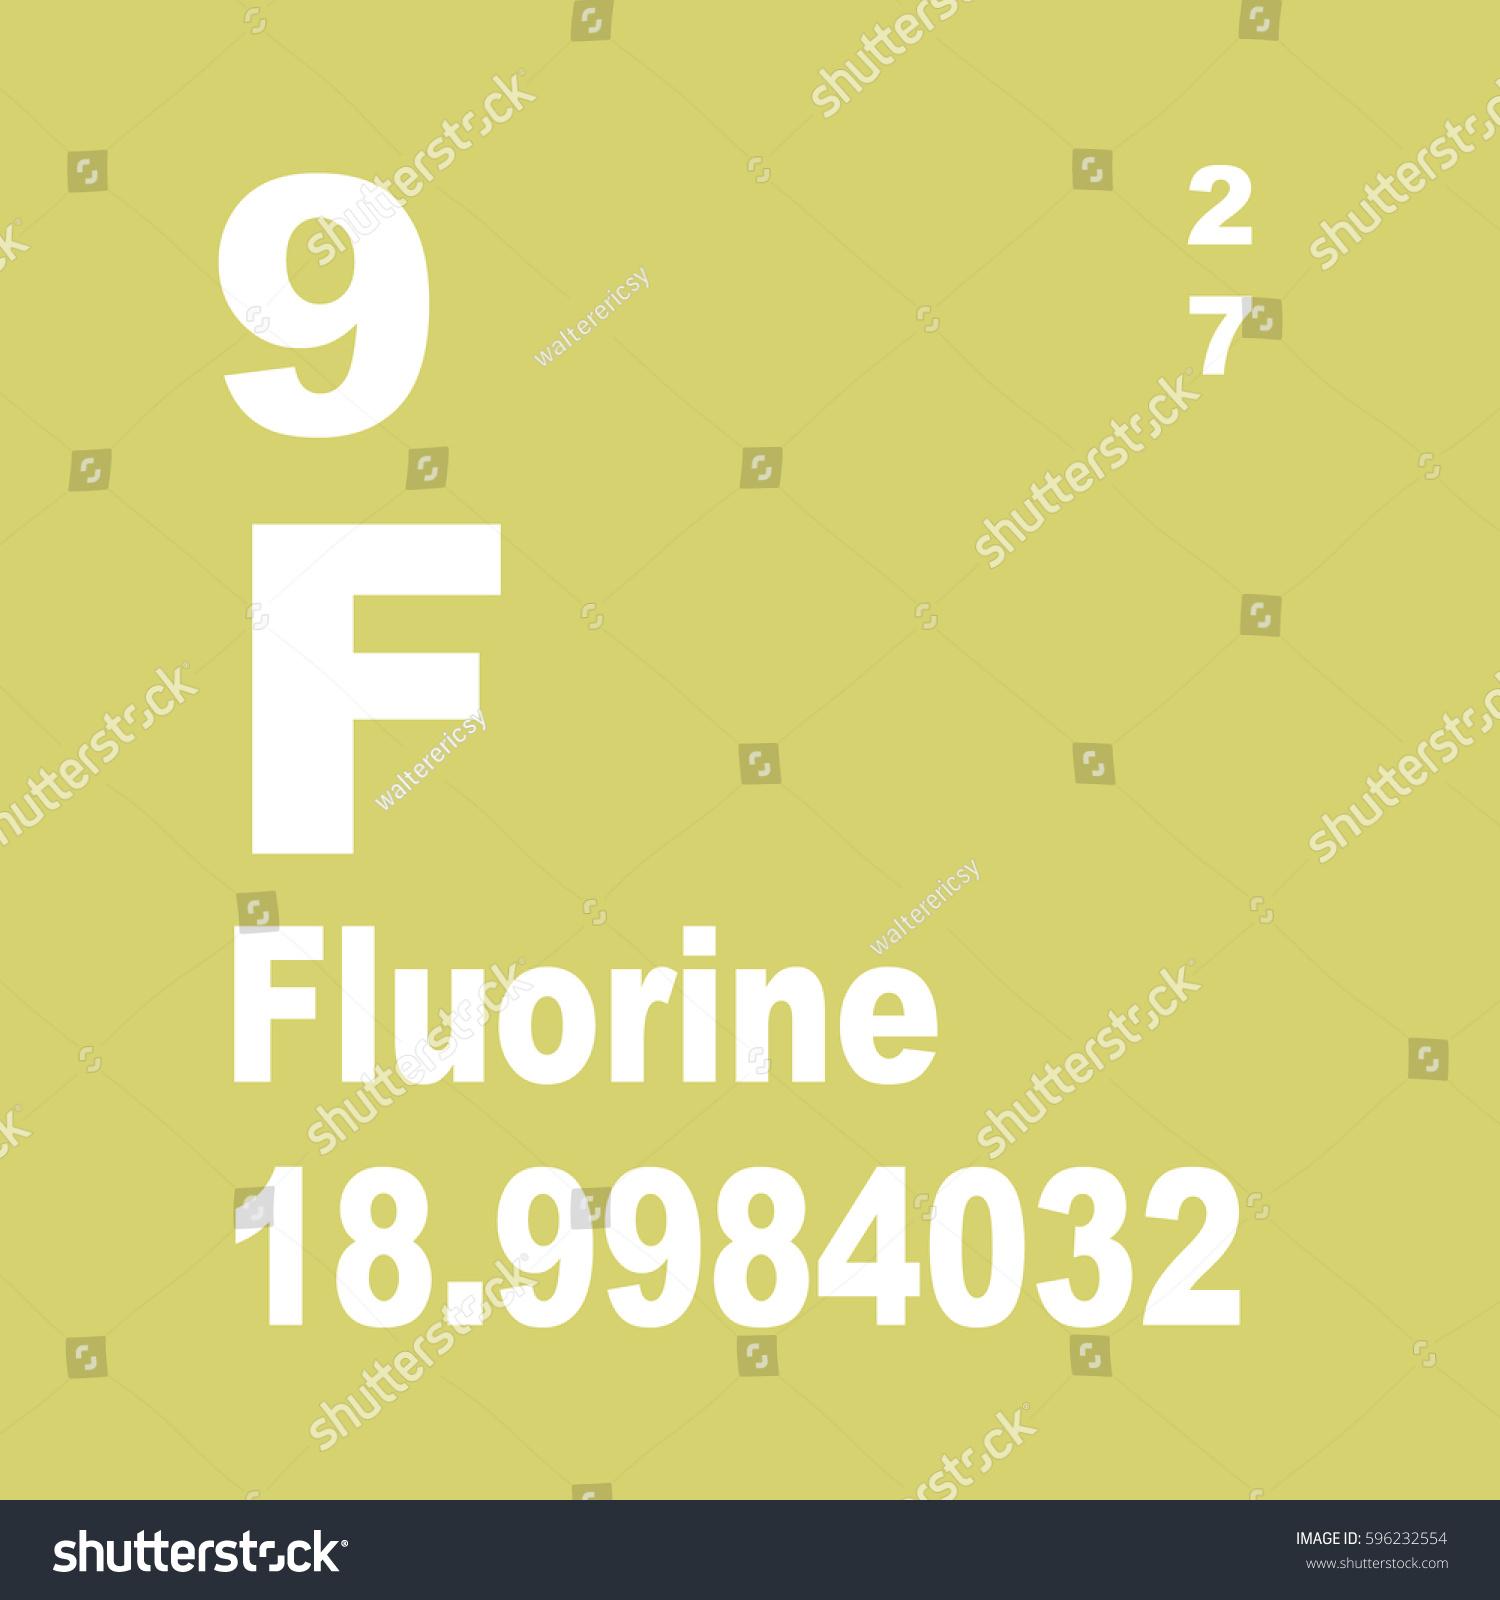 Fluorine periodic table elements stock illustration 596232554 fluorine periodic table of elements gamestrikefo Gallery